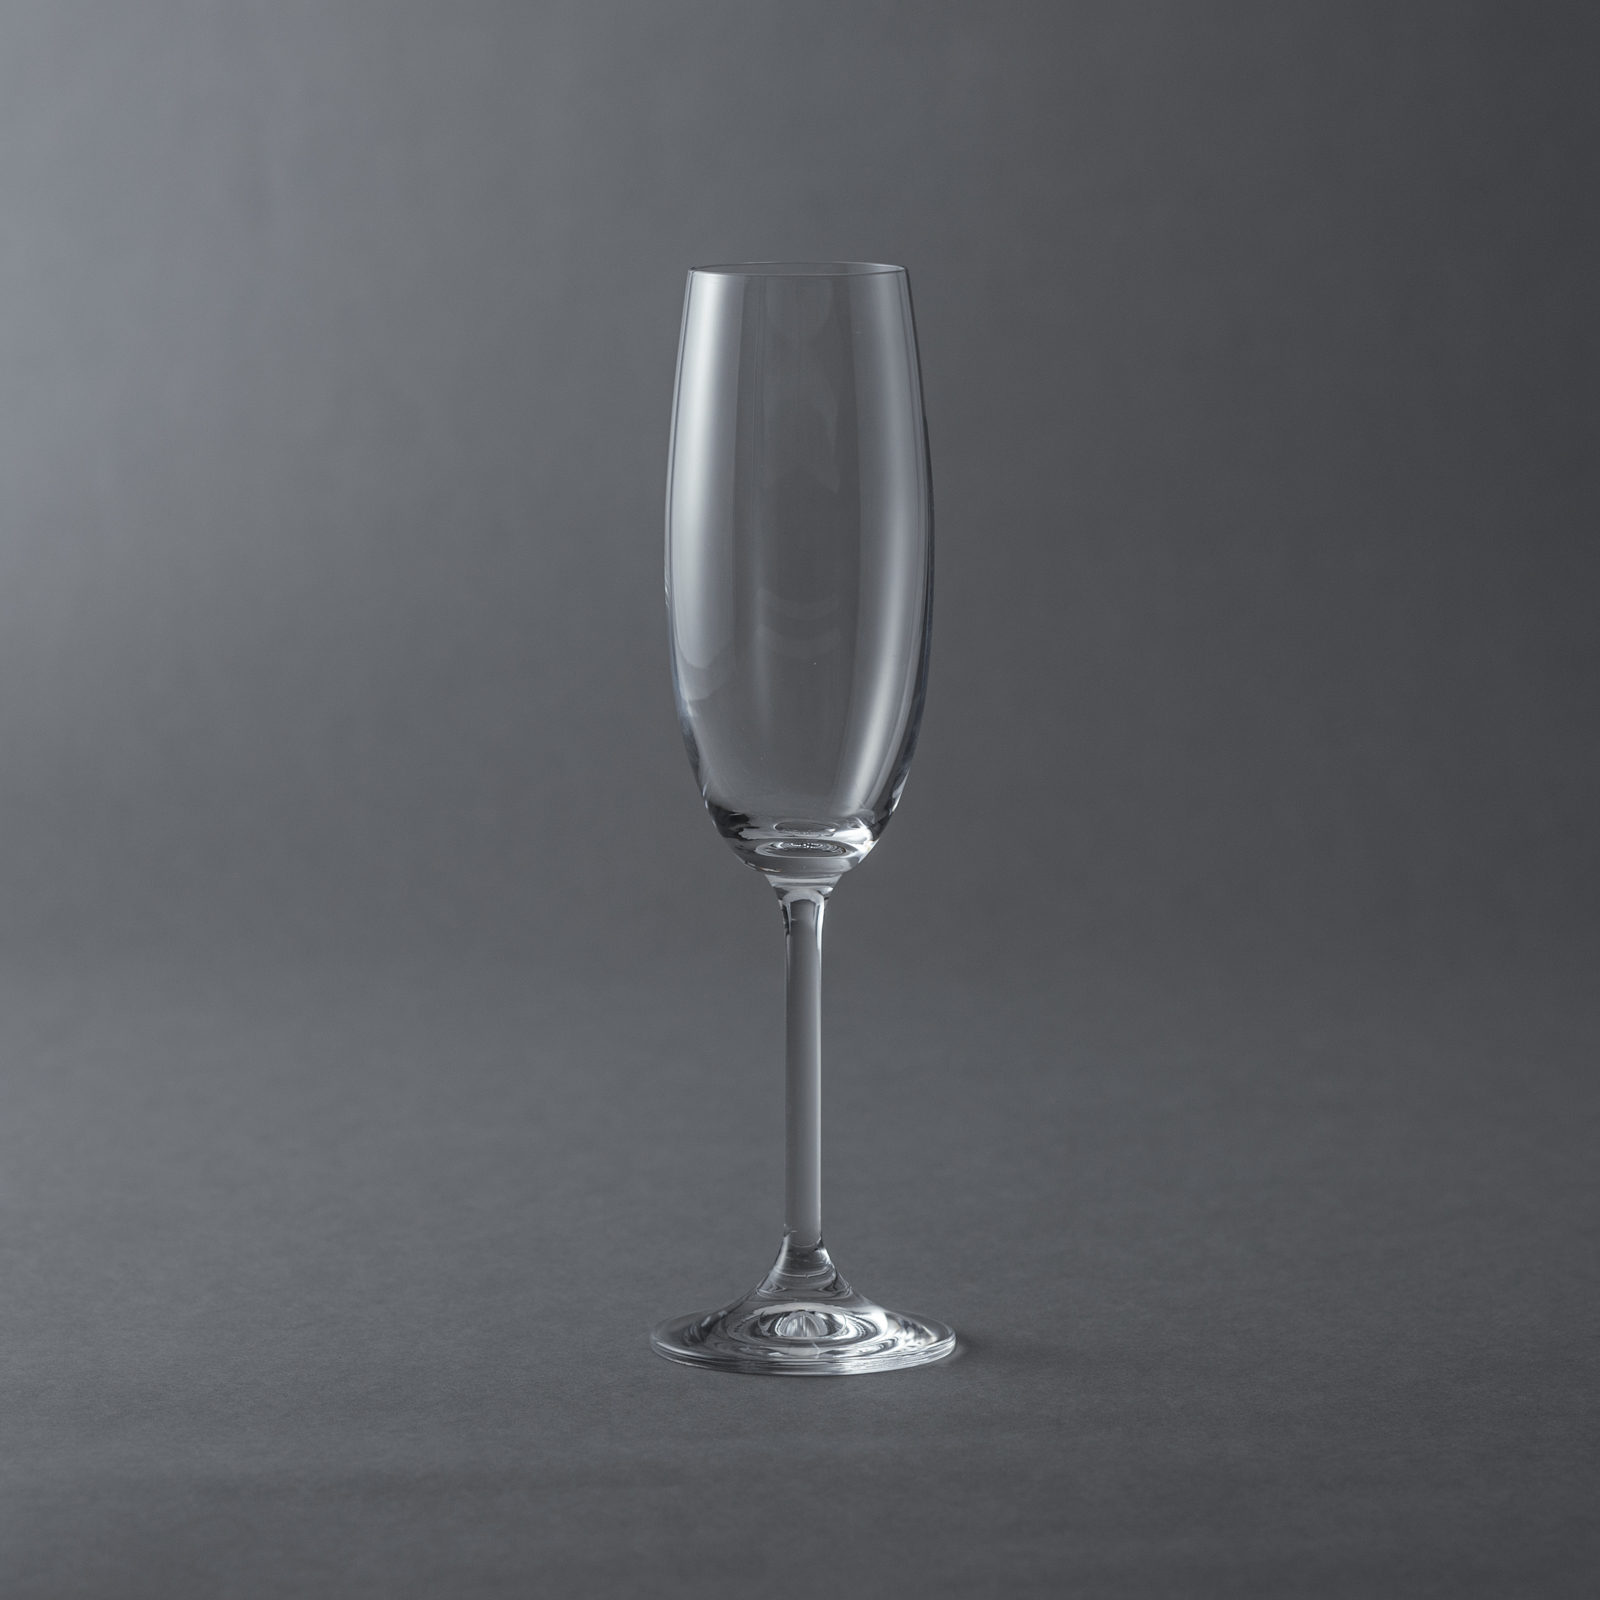 BOHEMIA Cristal _ ナタリー / シャンペンフルート